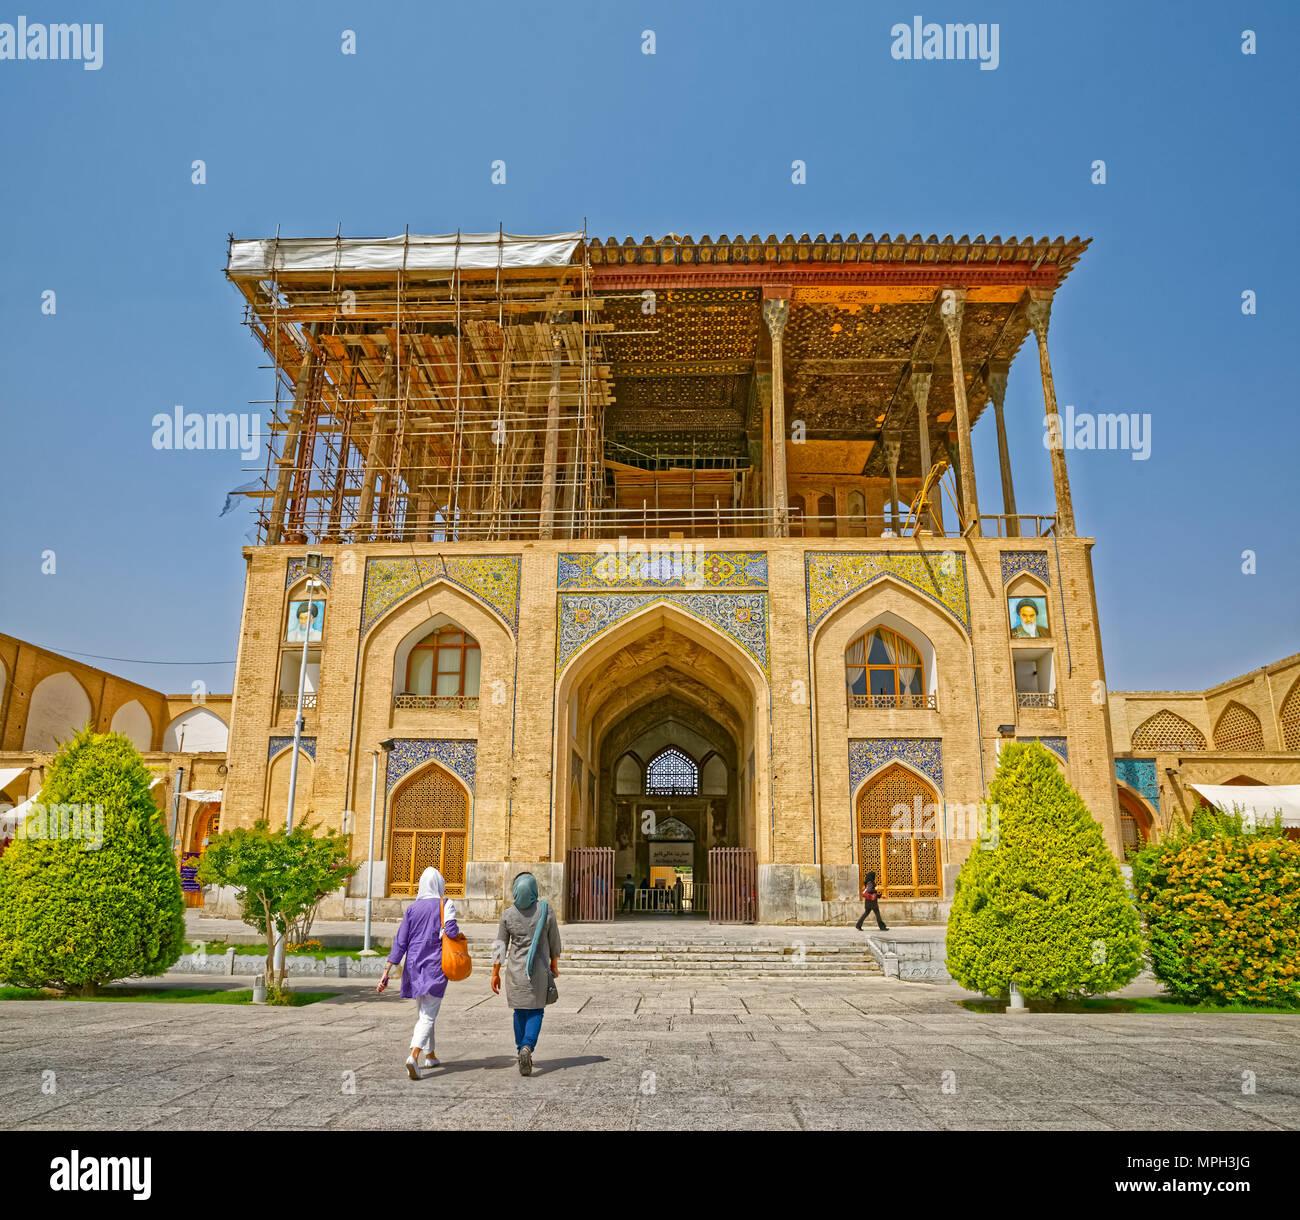 Isfahan Ali Qapu Palace Stock Photo